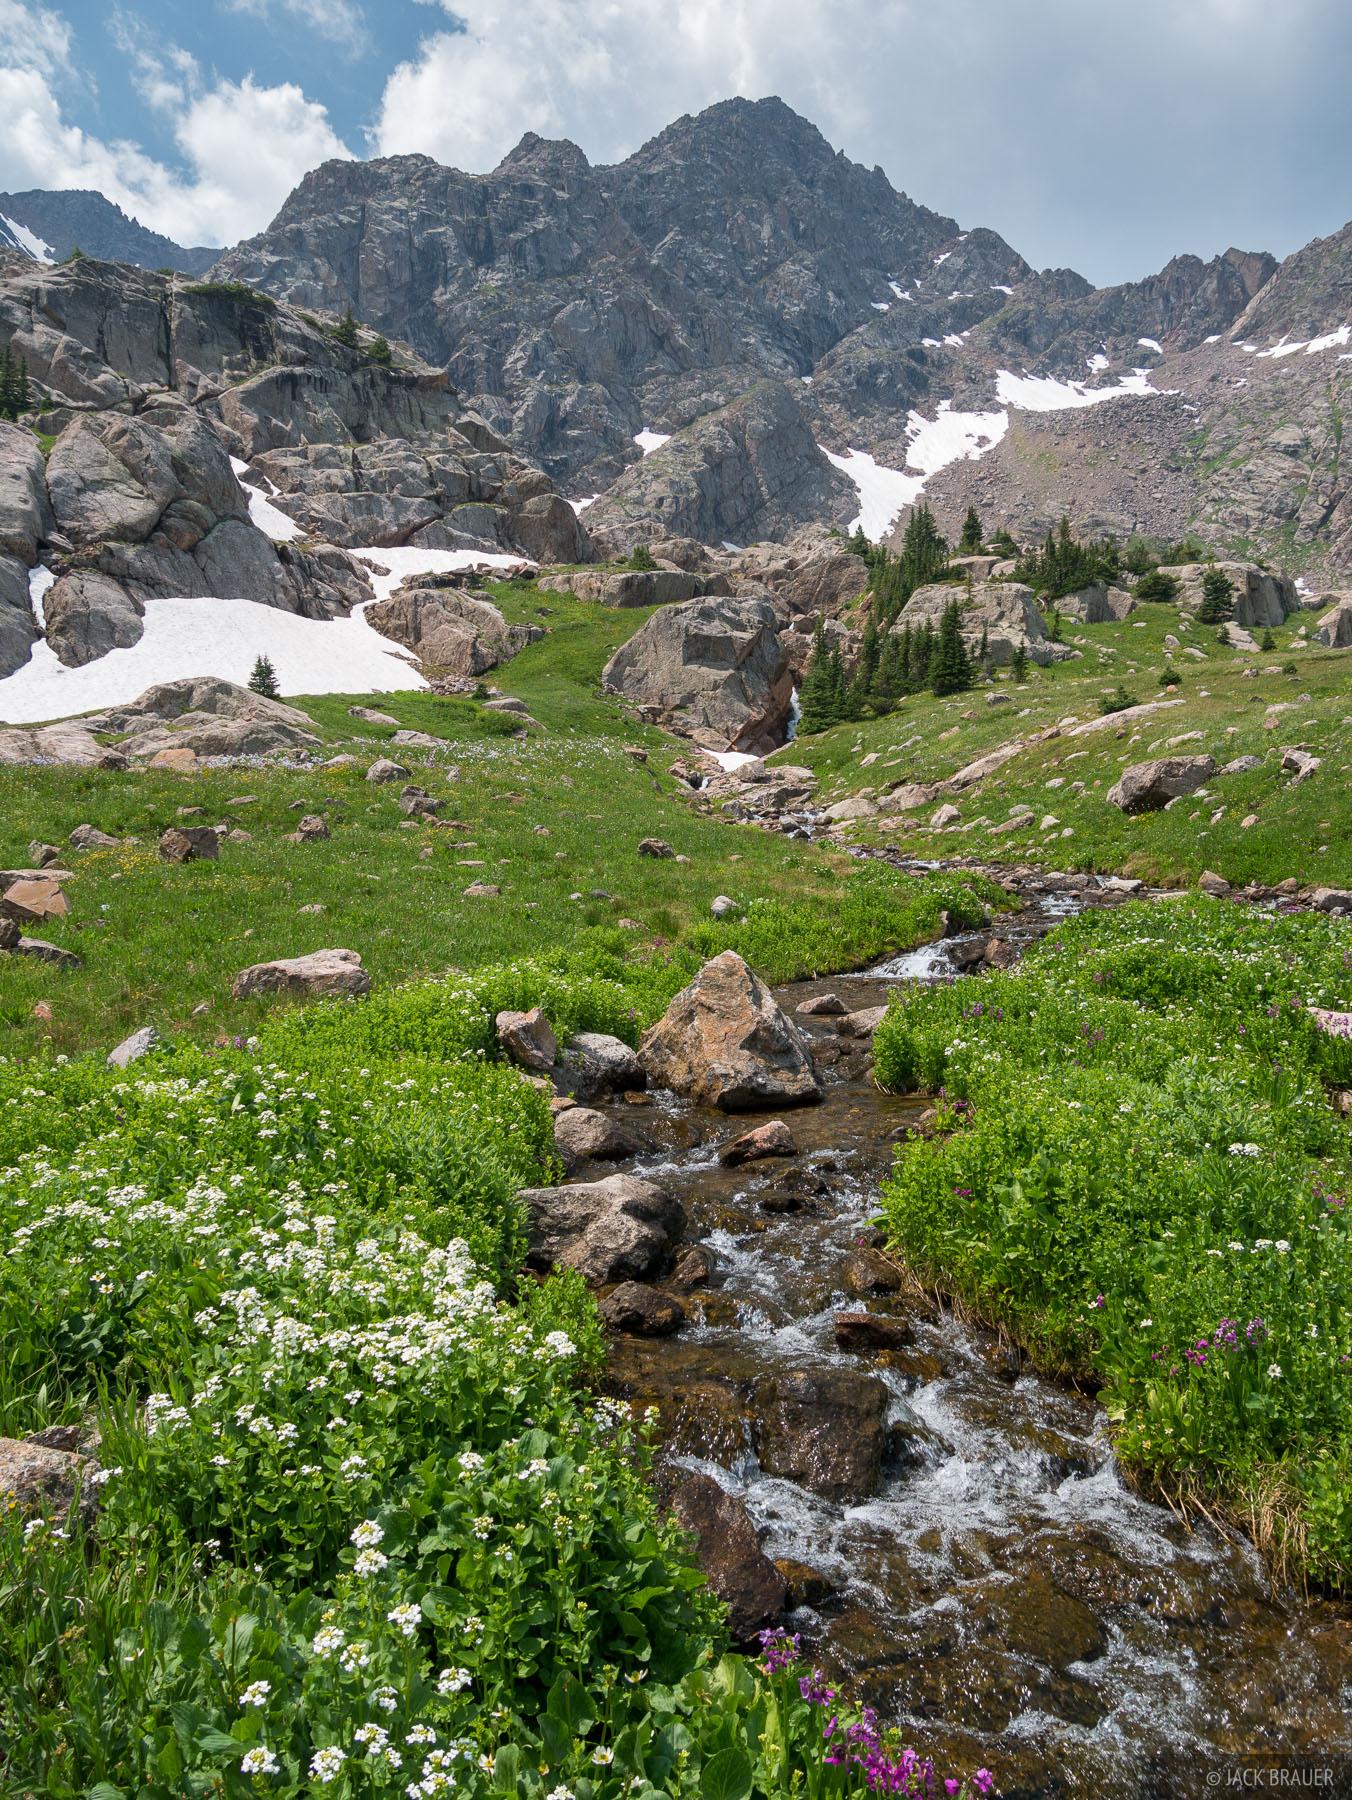 A typical high alpine Colorado summer paradise scene.